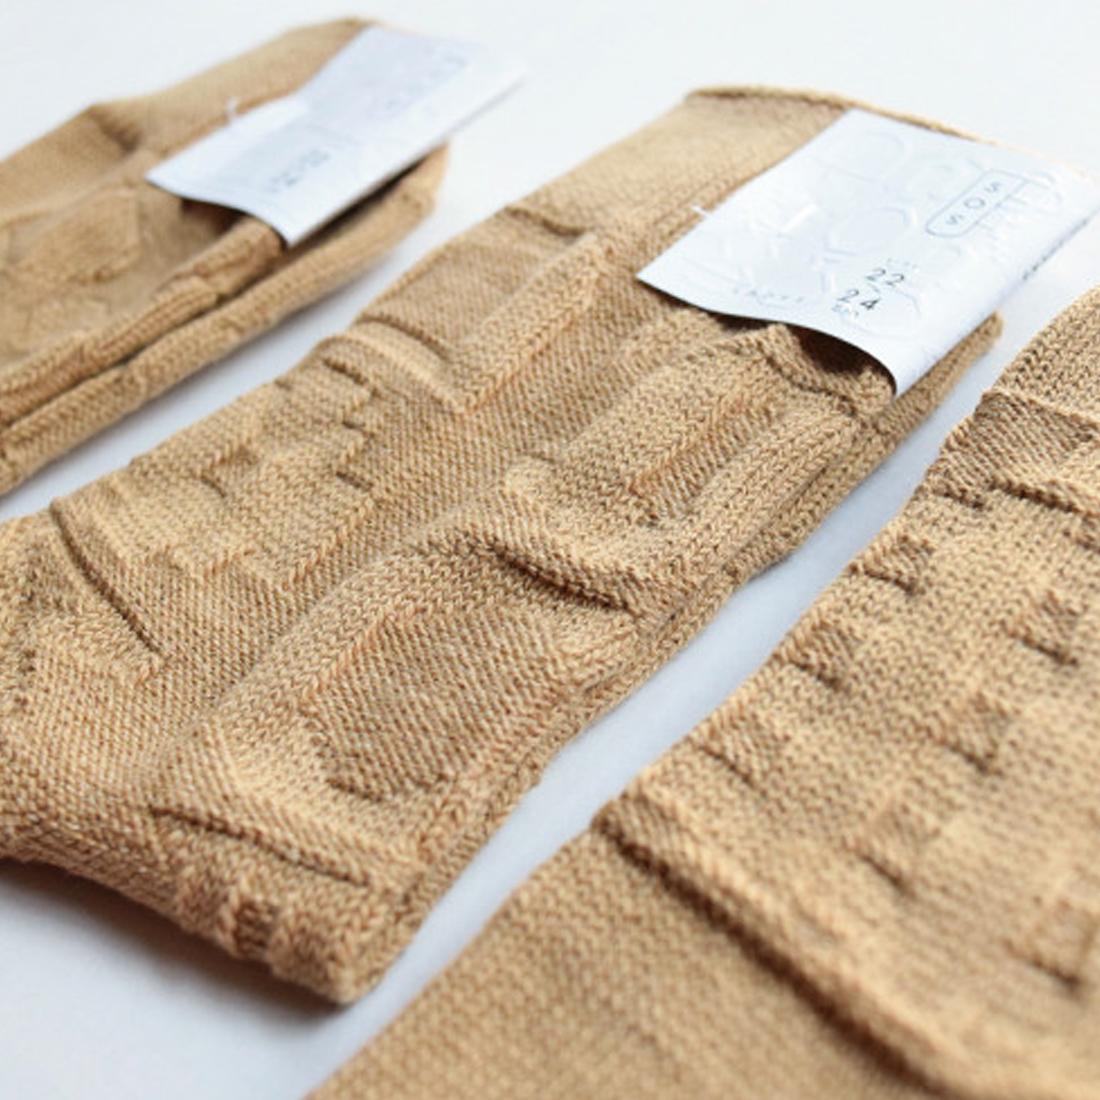 凸凹socks(BEIGE)